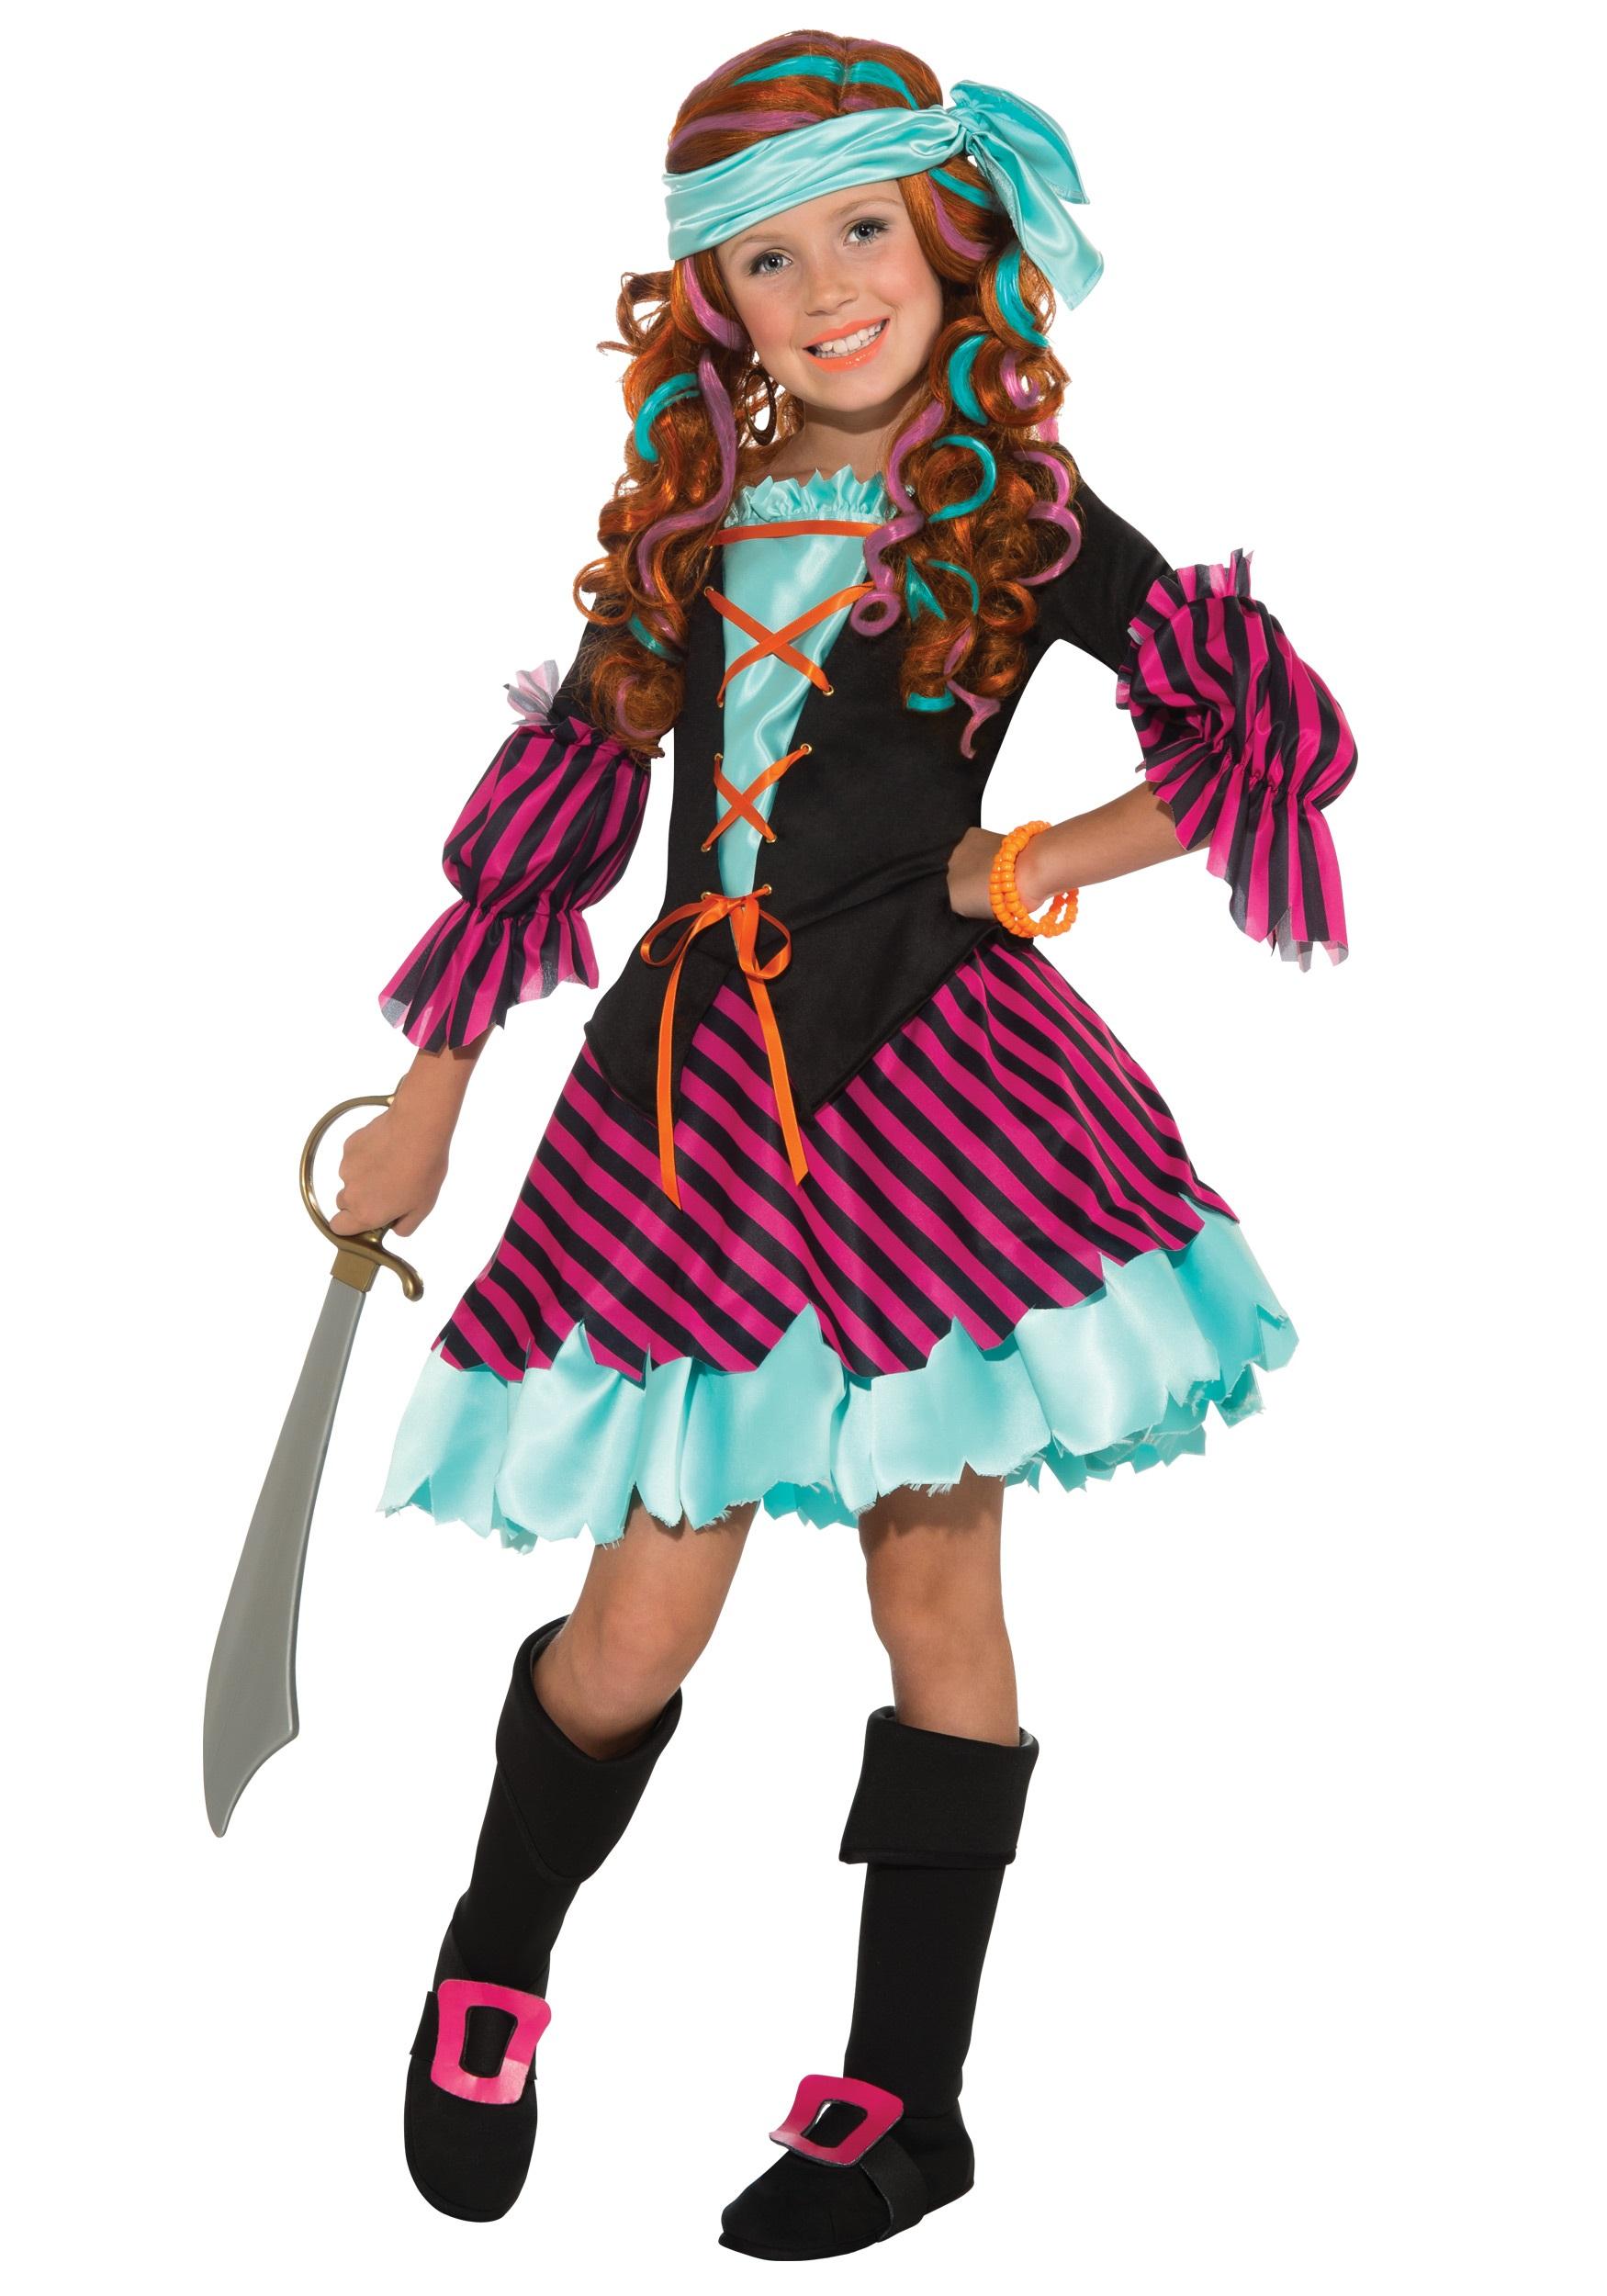 Salty Taffy Girls Costume  sc 1 st  Halloween Costumes AU & Salty Taffy Girls Pirate Costume